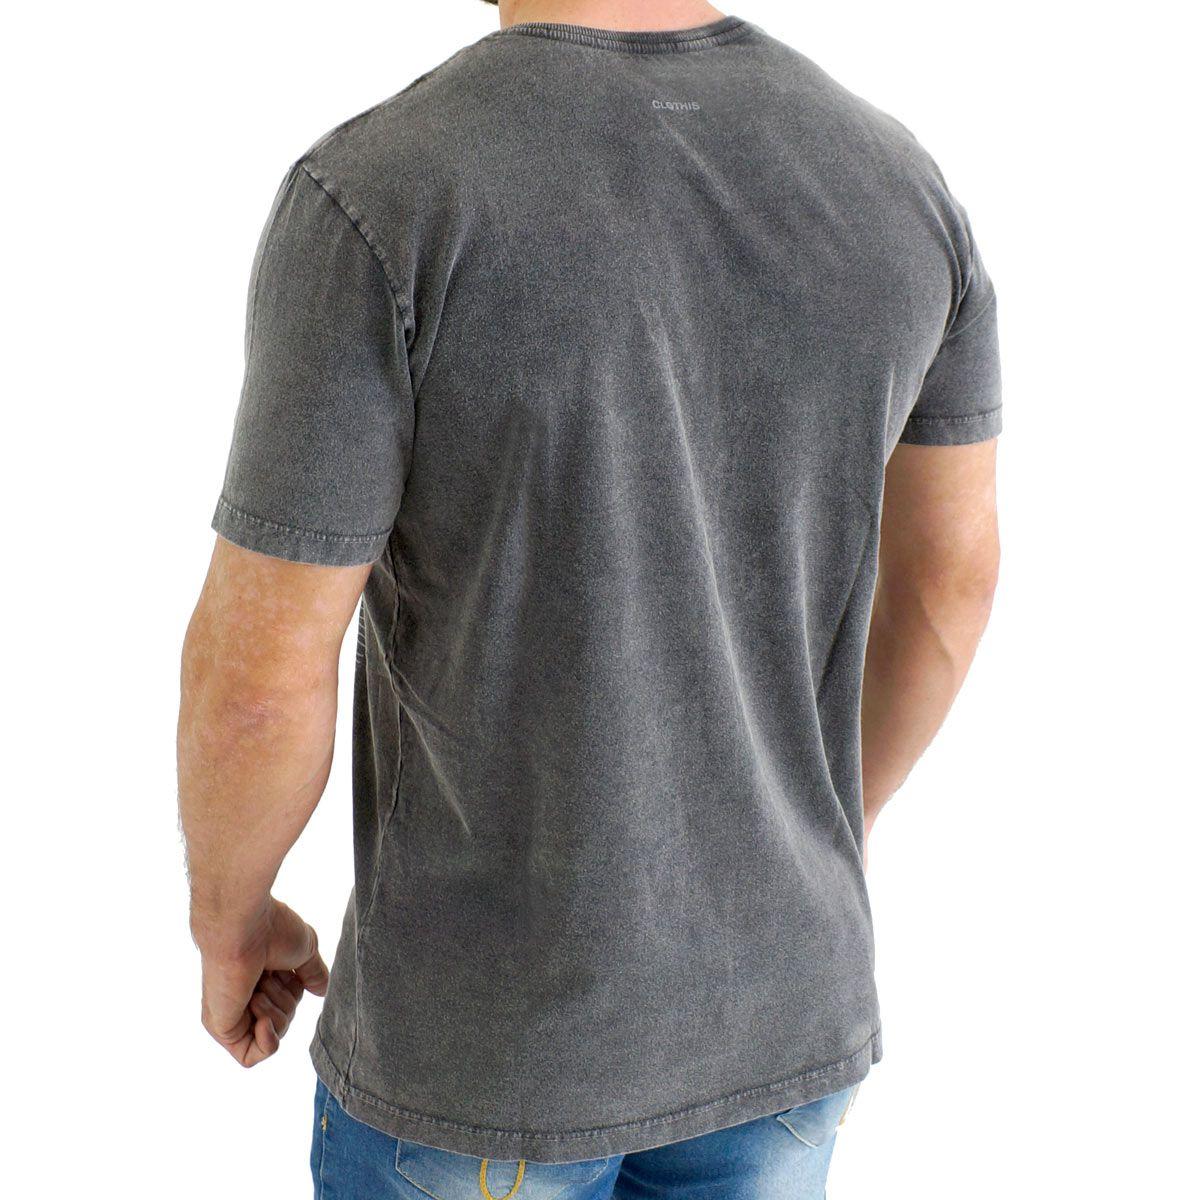 Camiseta Floripa Division Marmorizada Soft